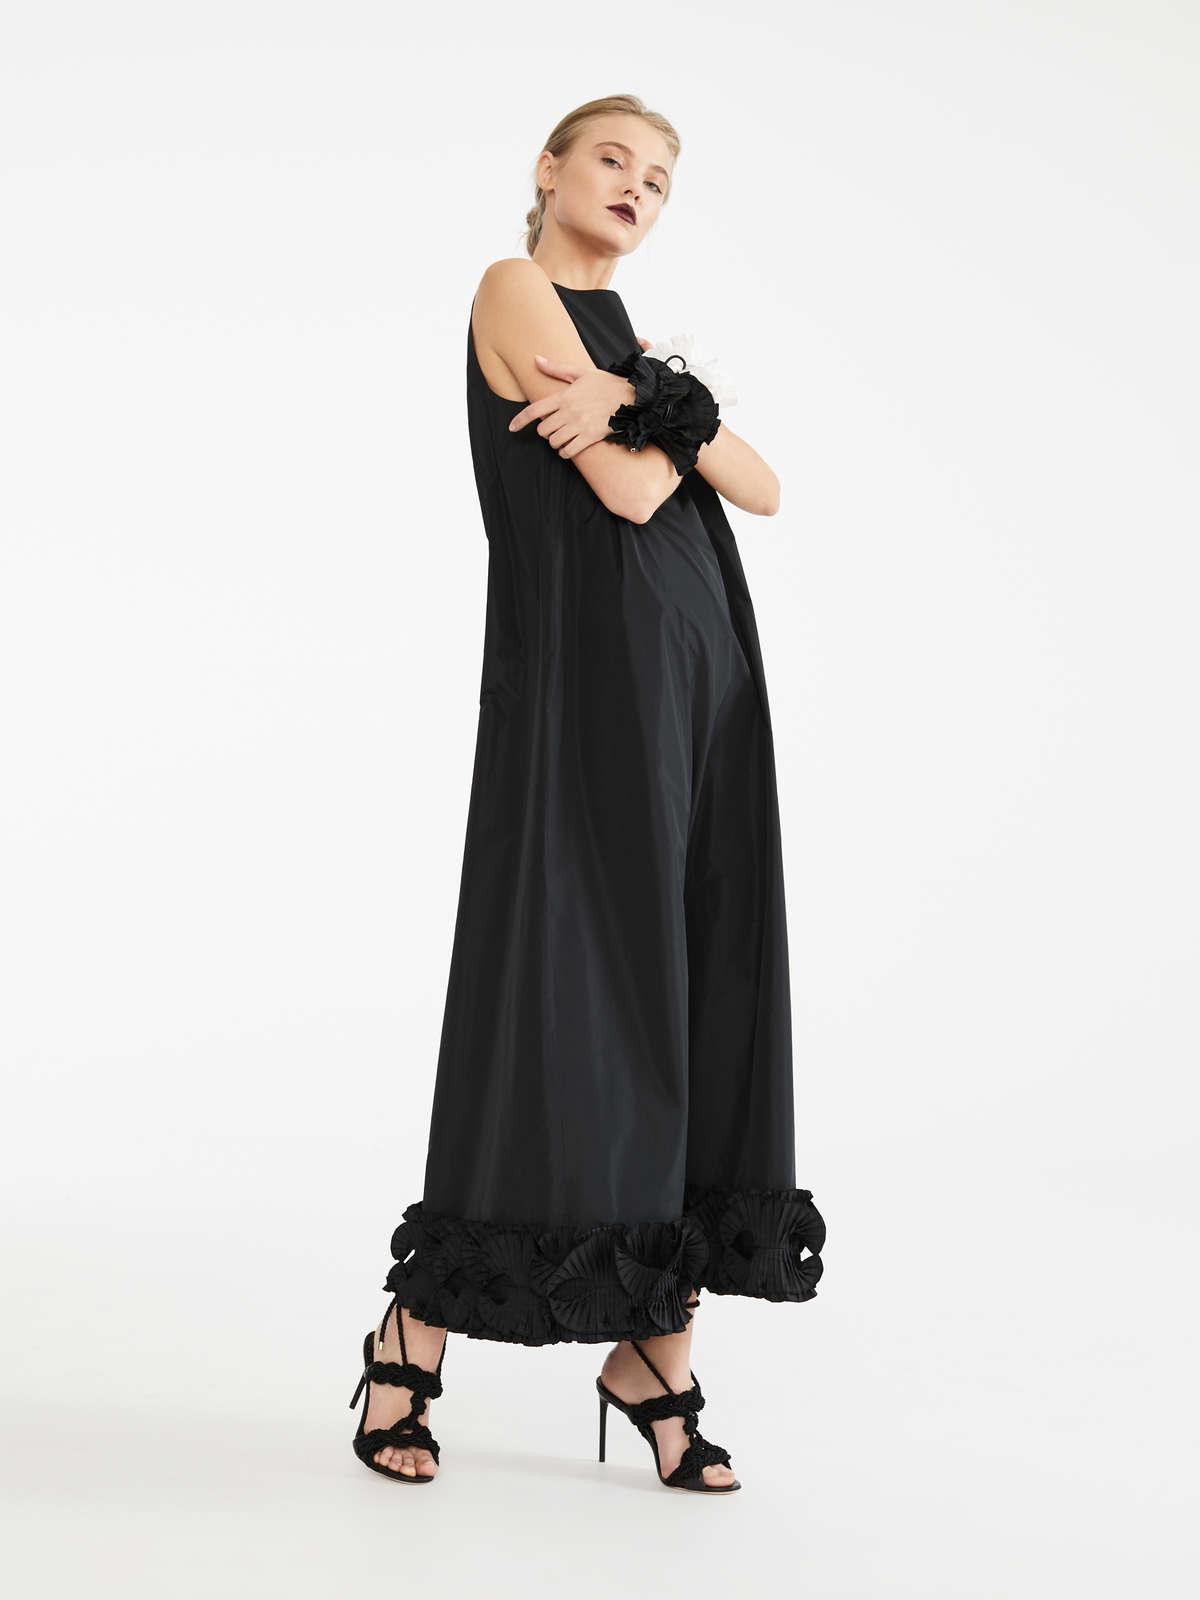 bceef896cf5 Taffeta dress